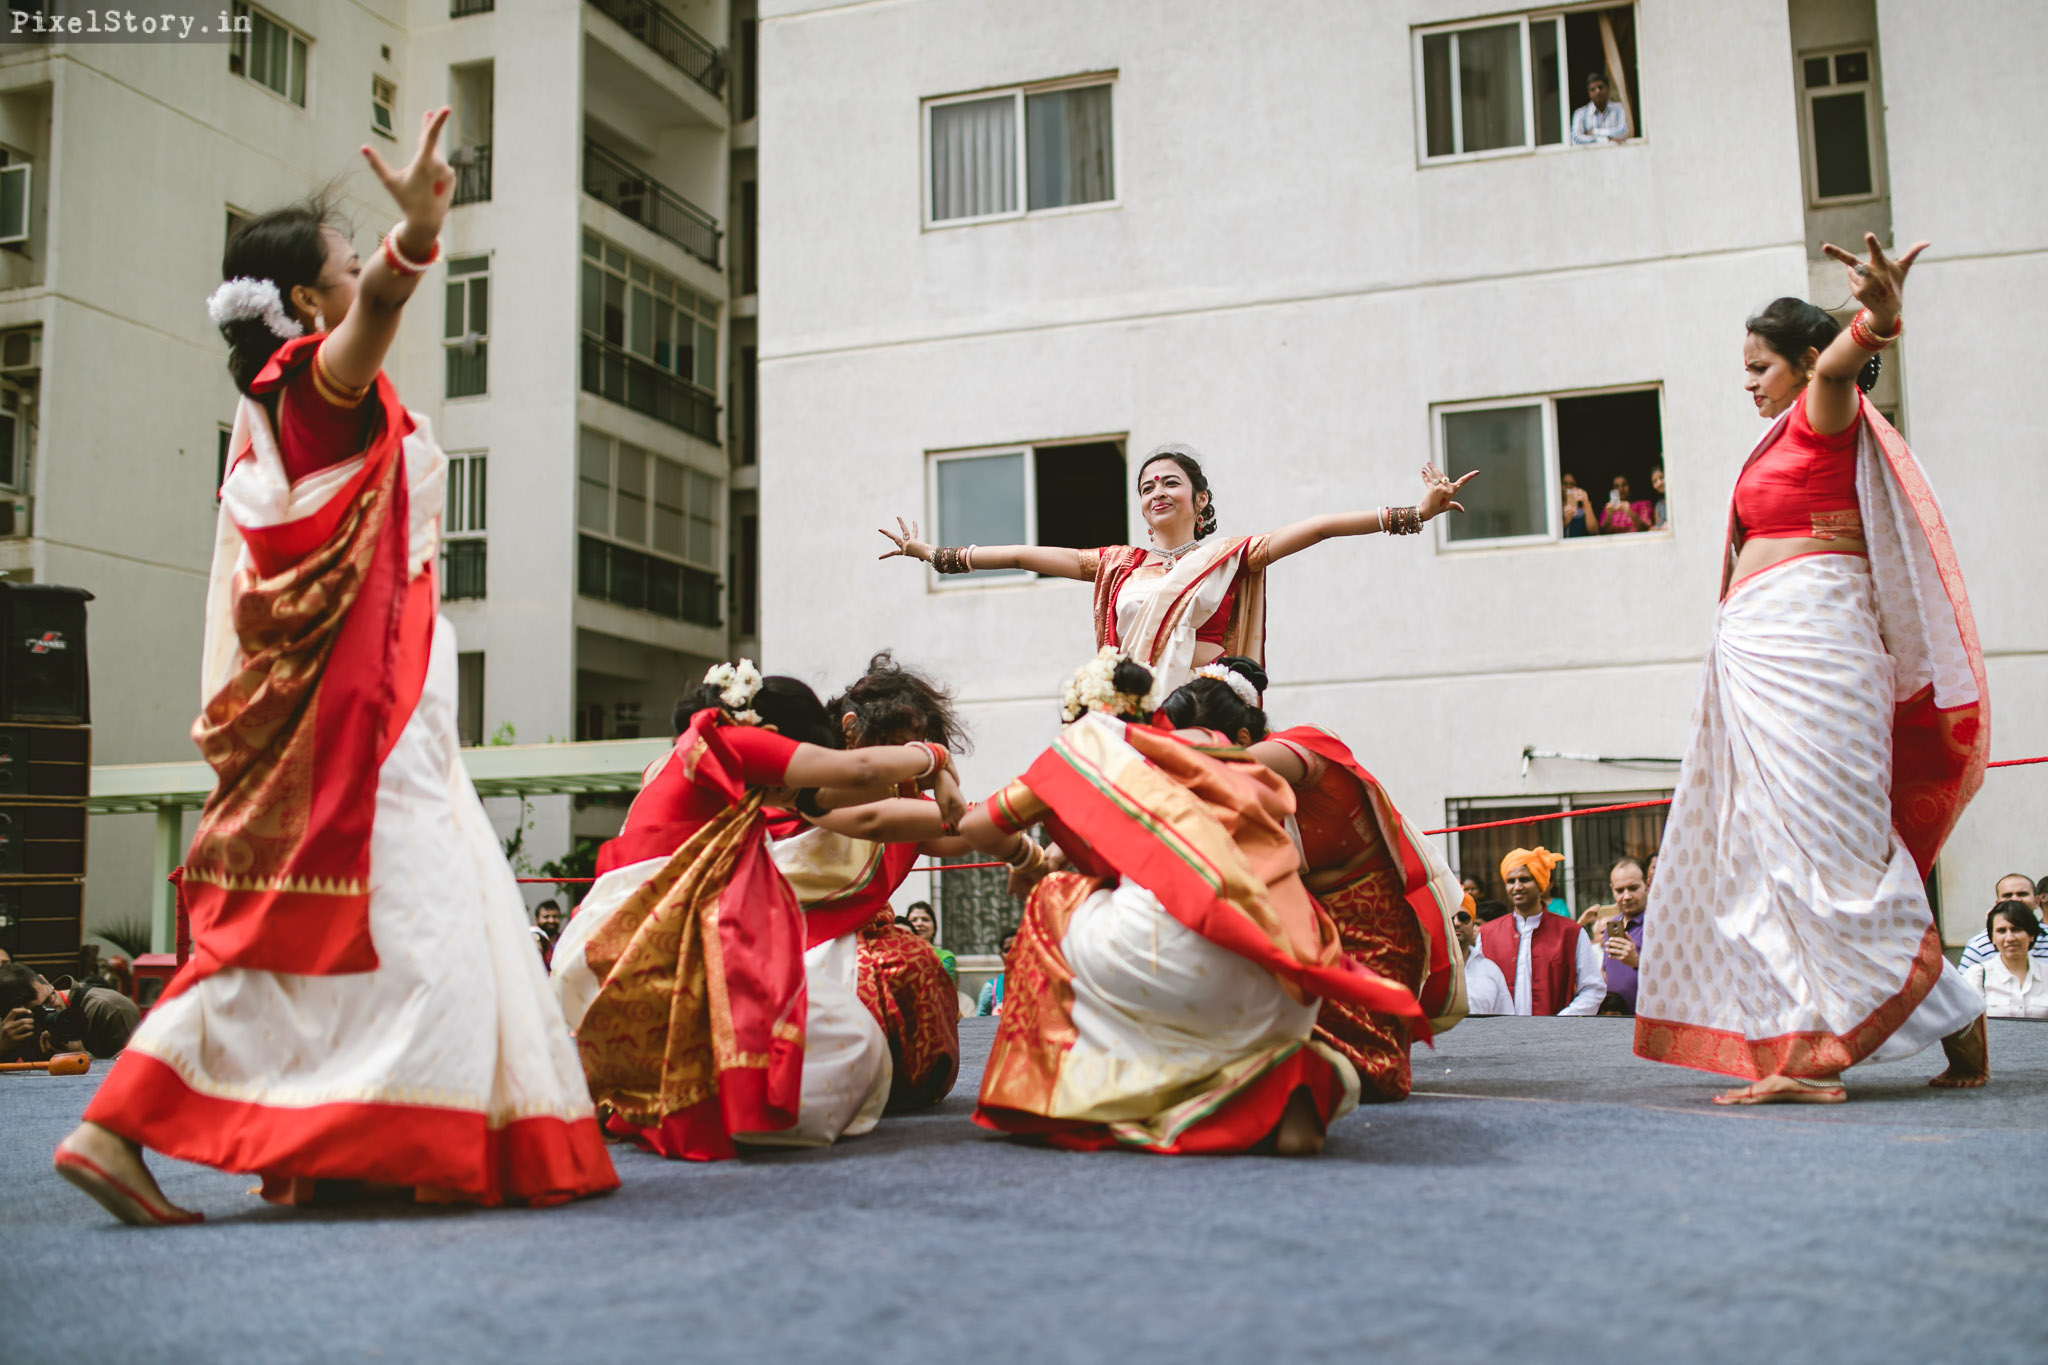 PixelStory-Ganesh-Utsav-2017-075.jpg